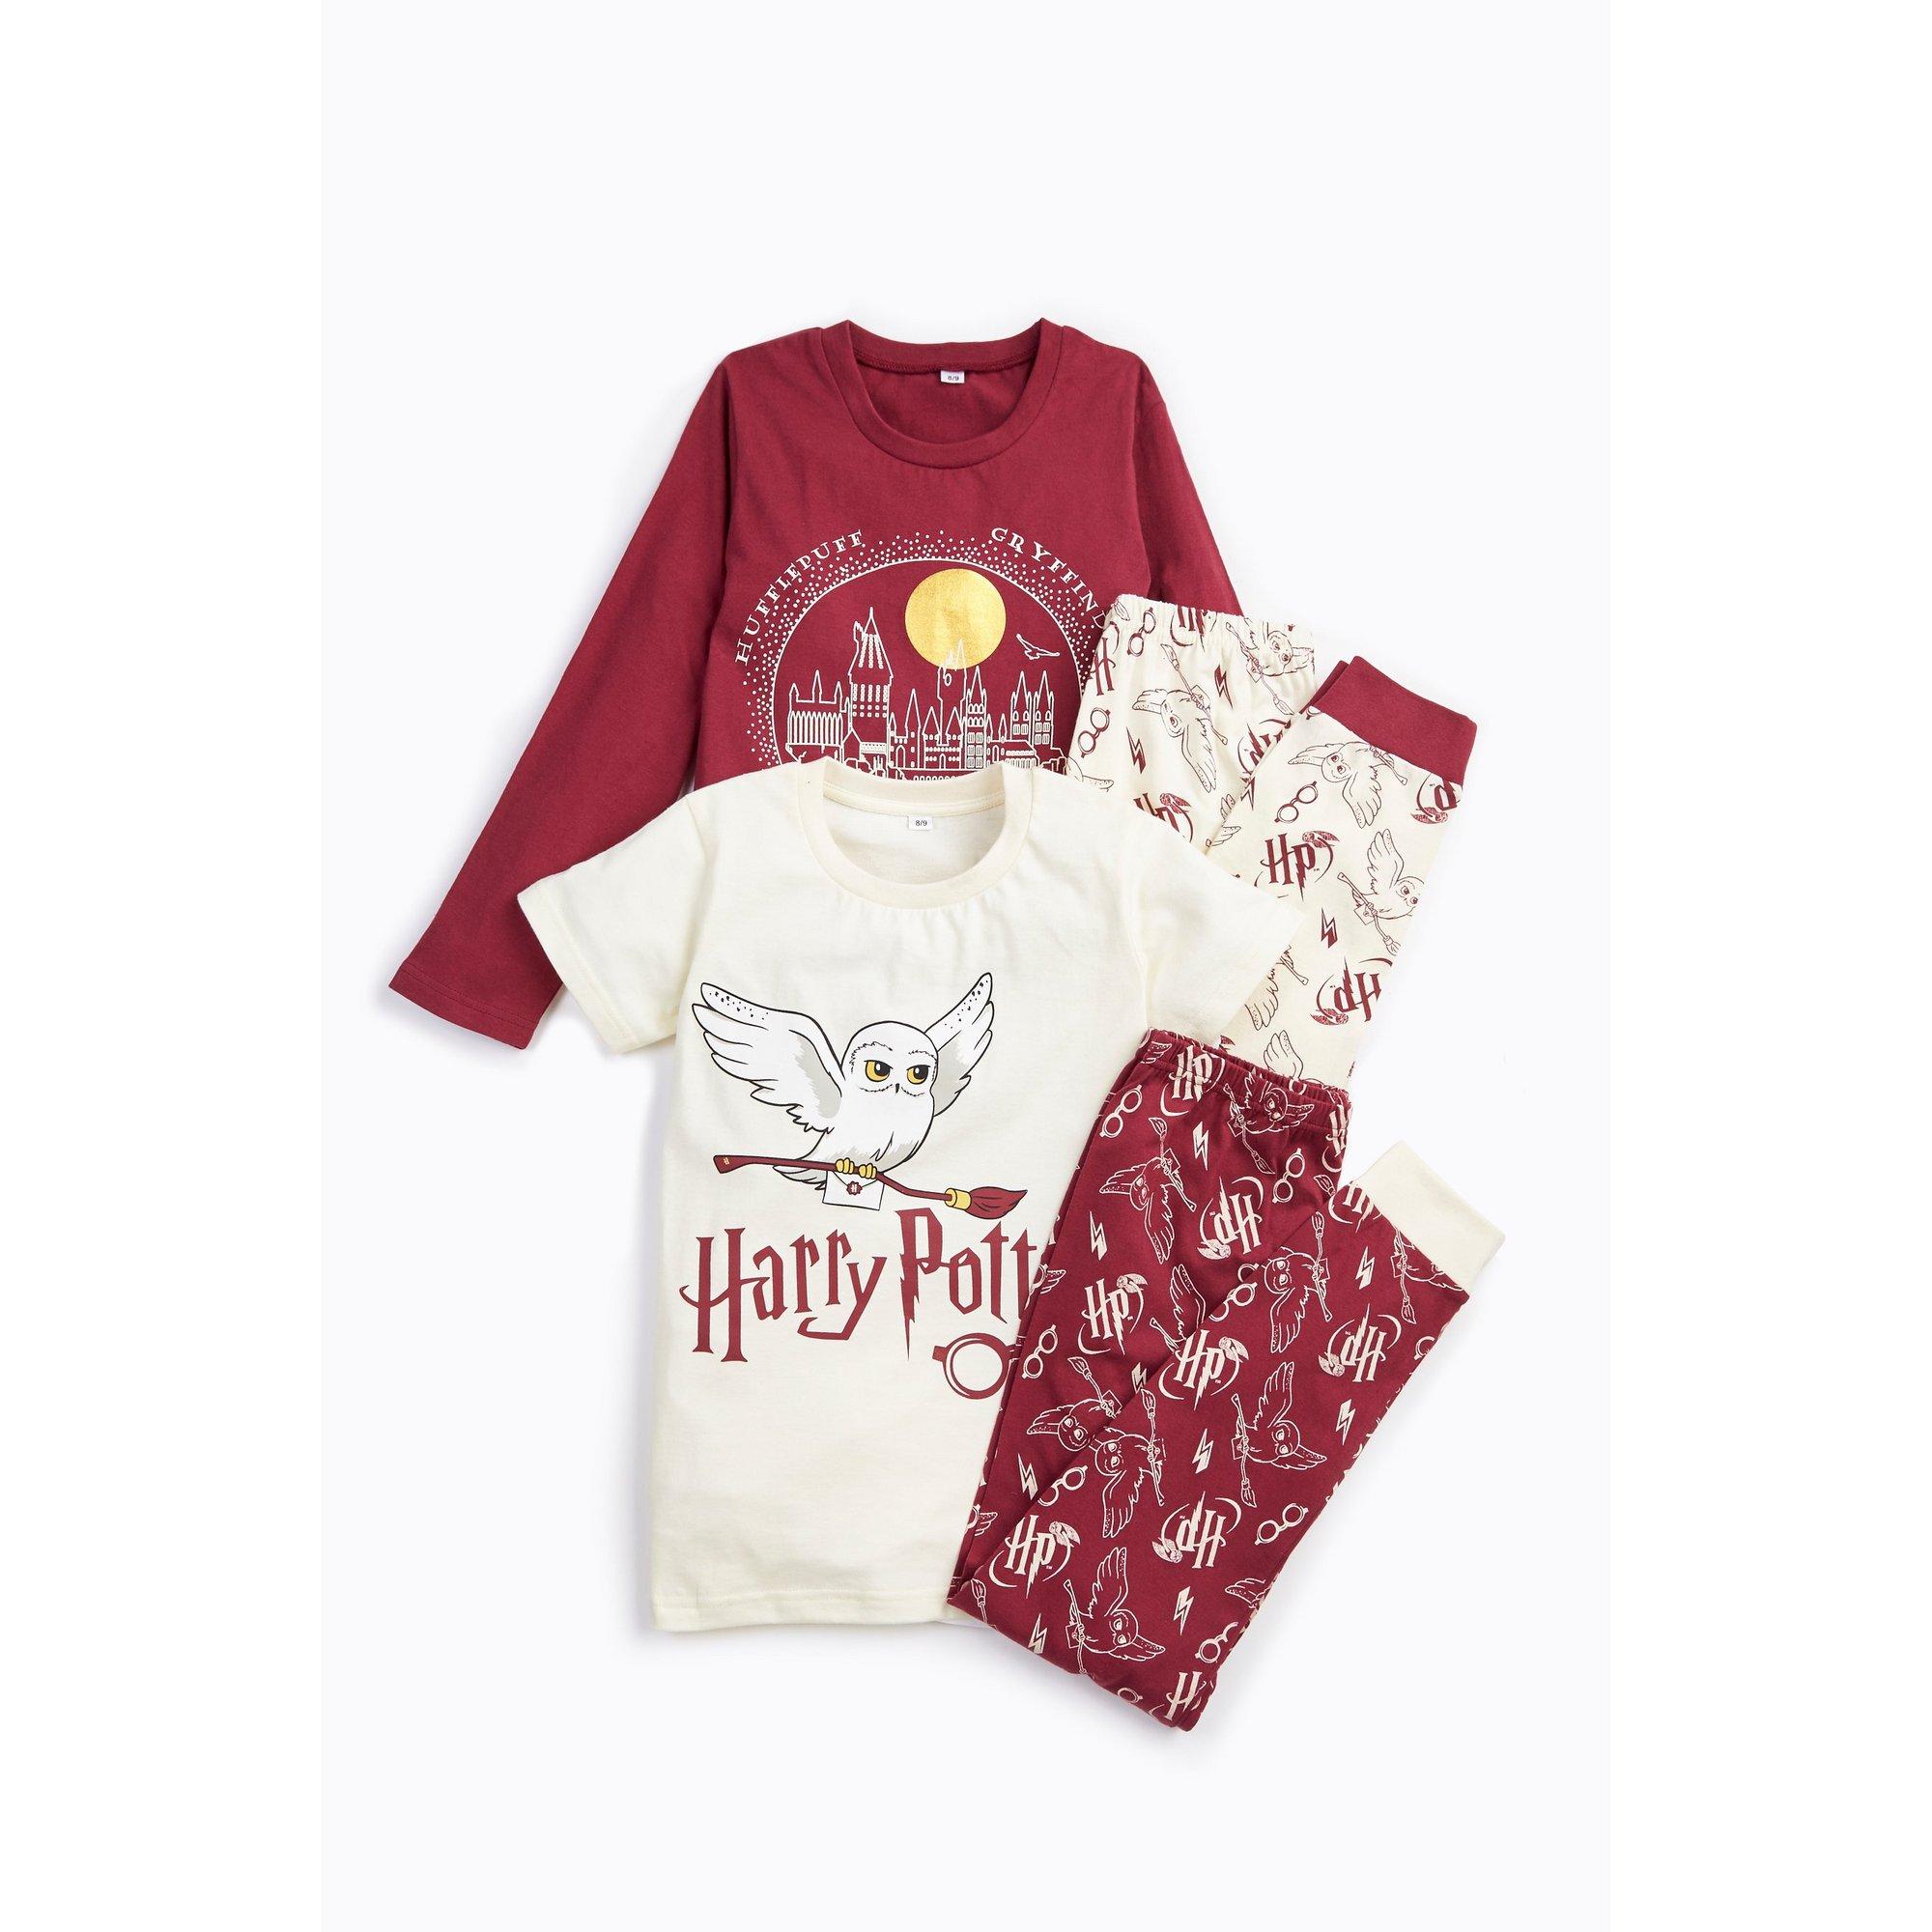 Image of Girls Pack of 2 Harry Potter Pyjamas